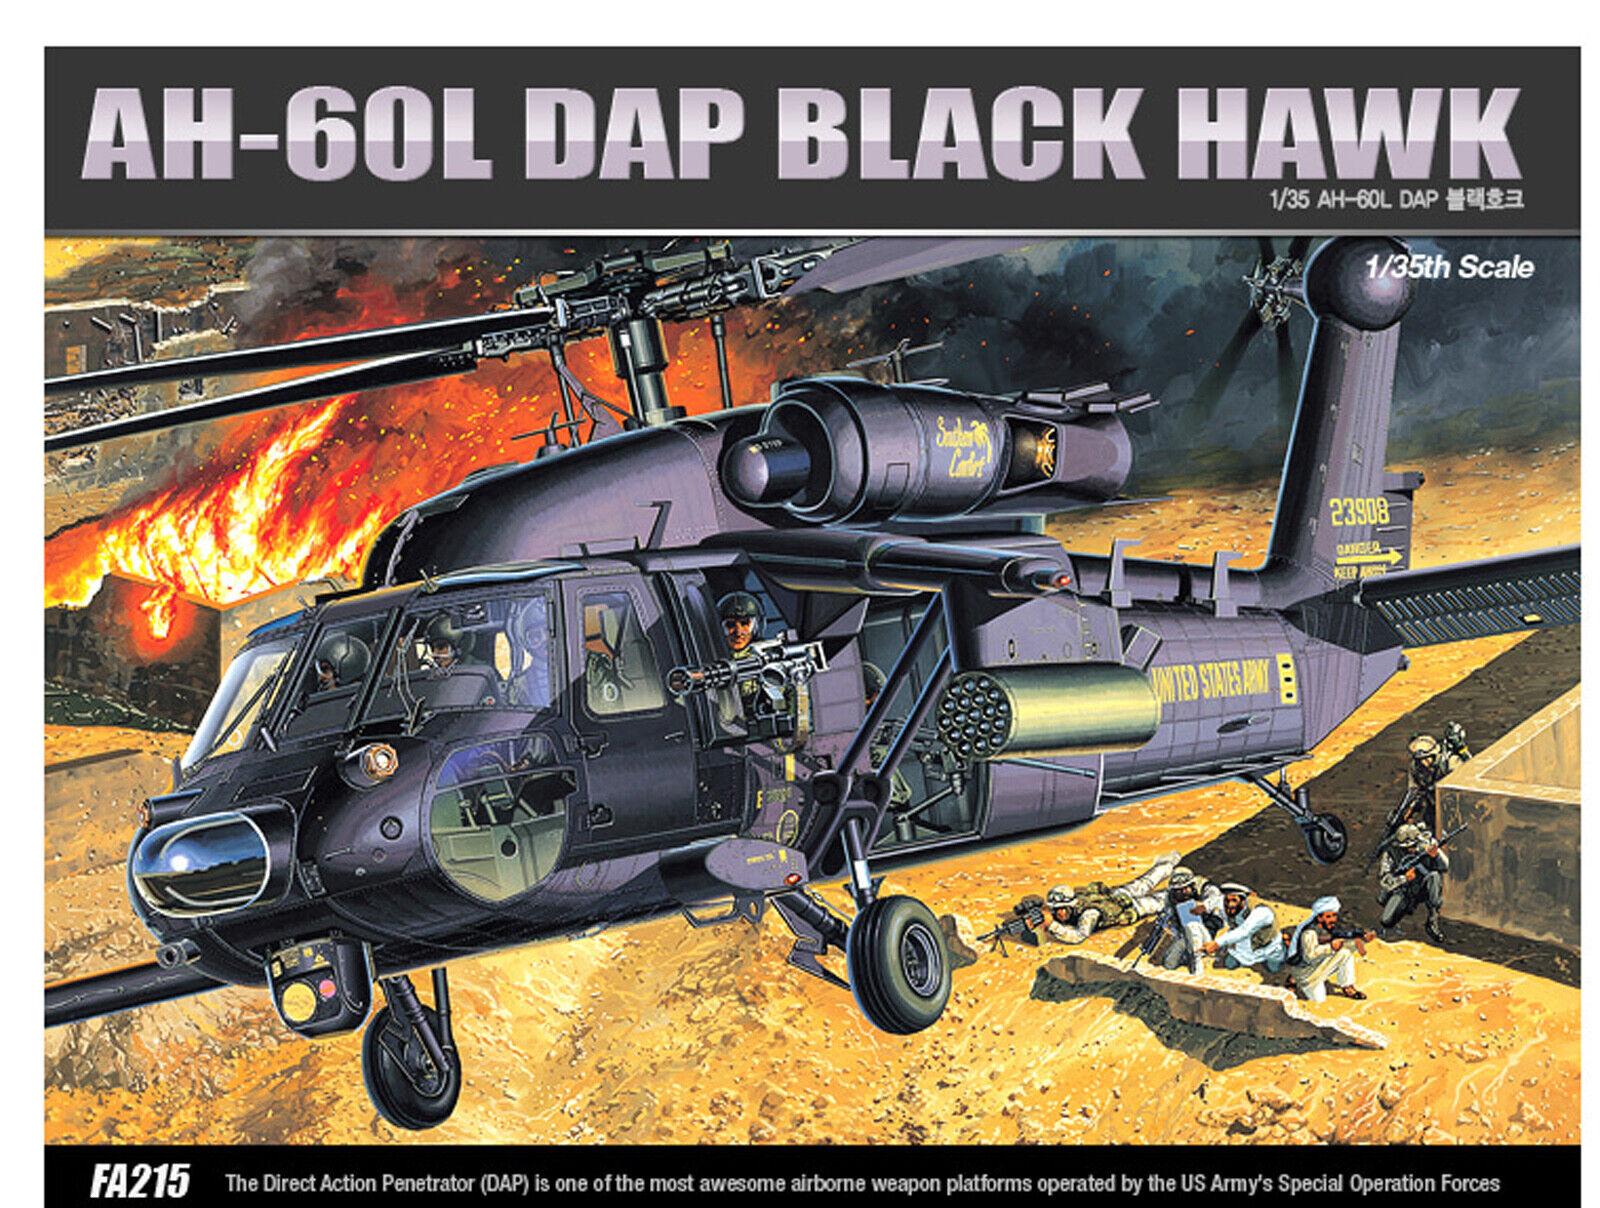 1 35 AH-60L DAP schwarz HAWKS   12115 Hellicopter 1 35 Military Modell